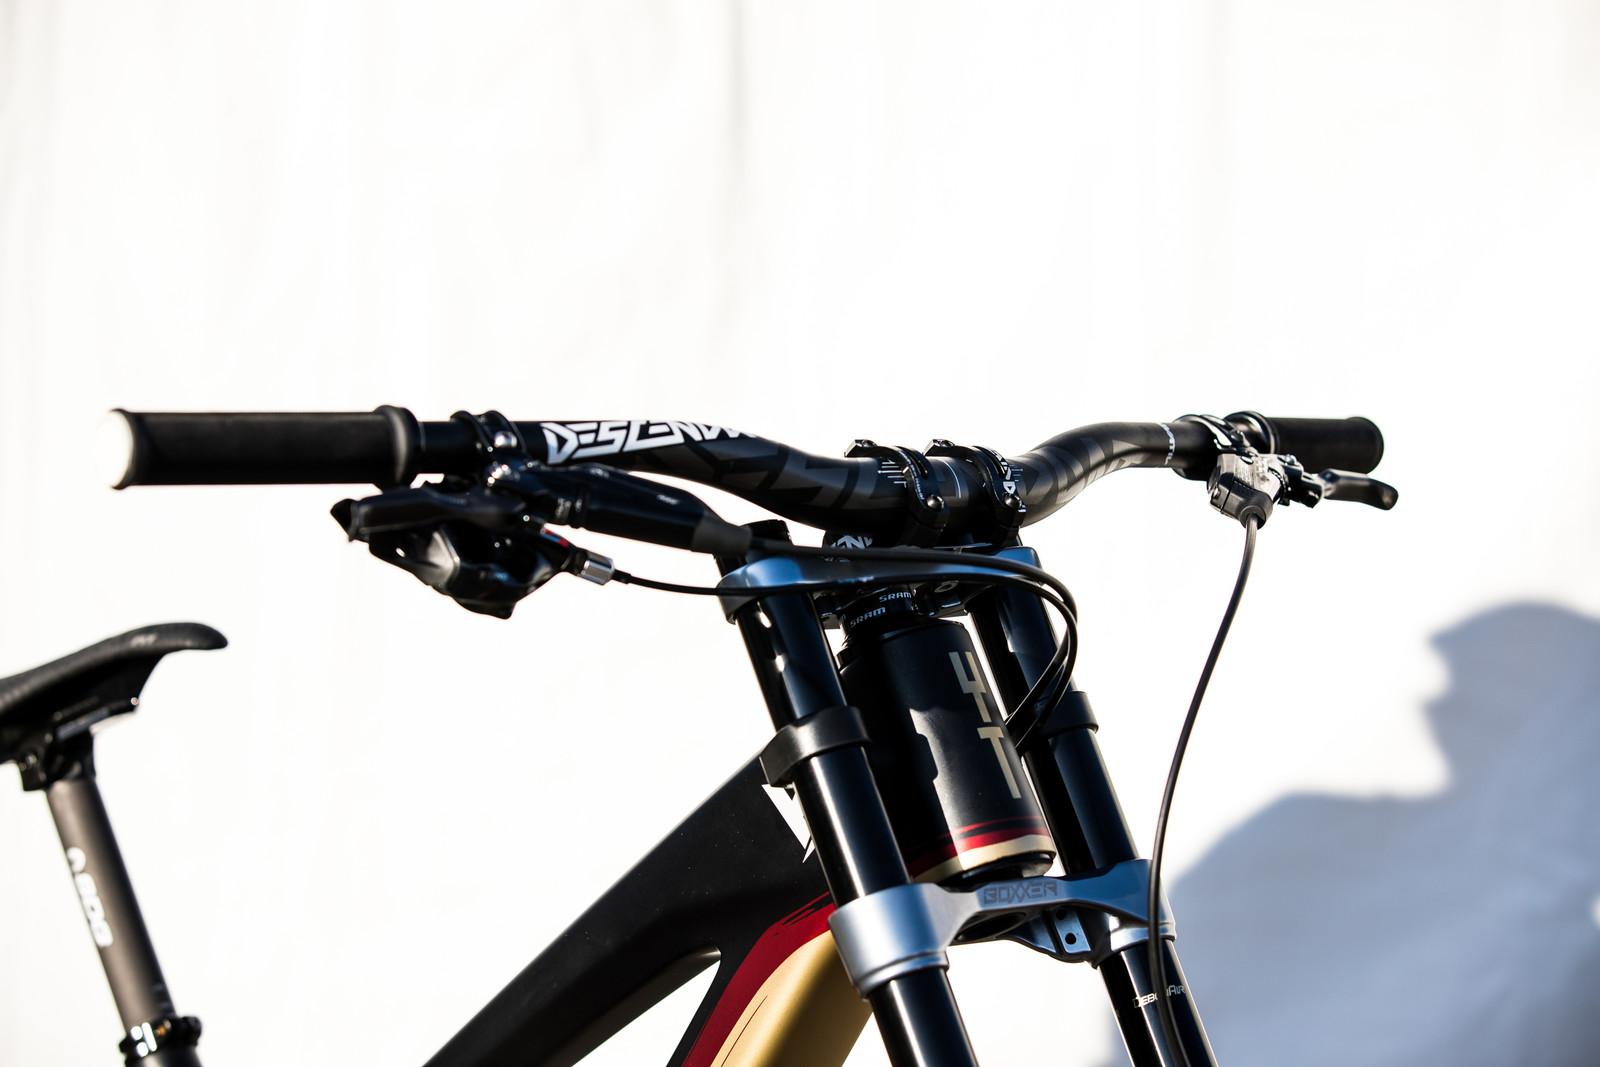 MSA19 BB020049 - Erik Irmisch's YT TUES at 2019 Worlds MSA - Mountain Biking Pictures - Vital MTB